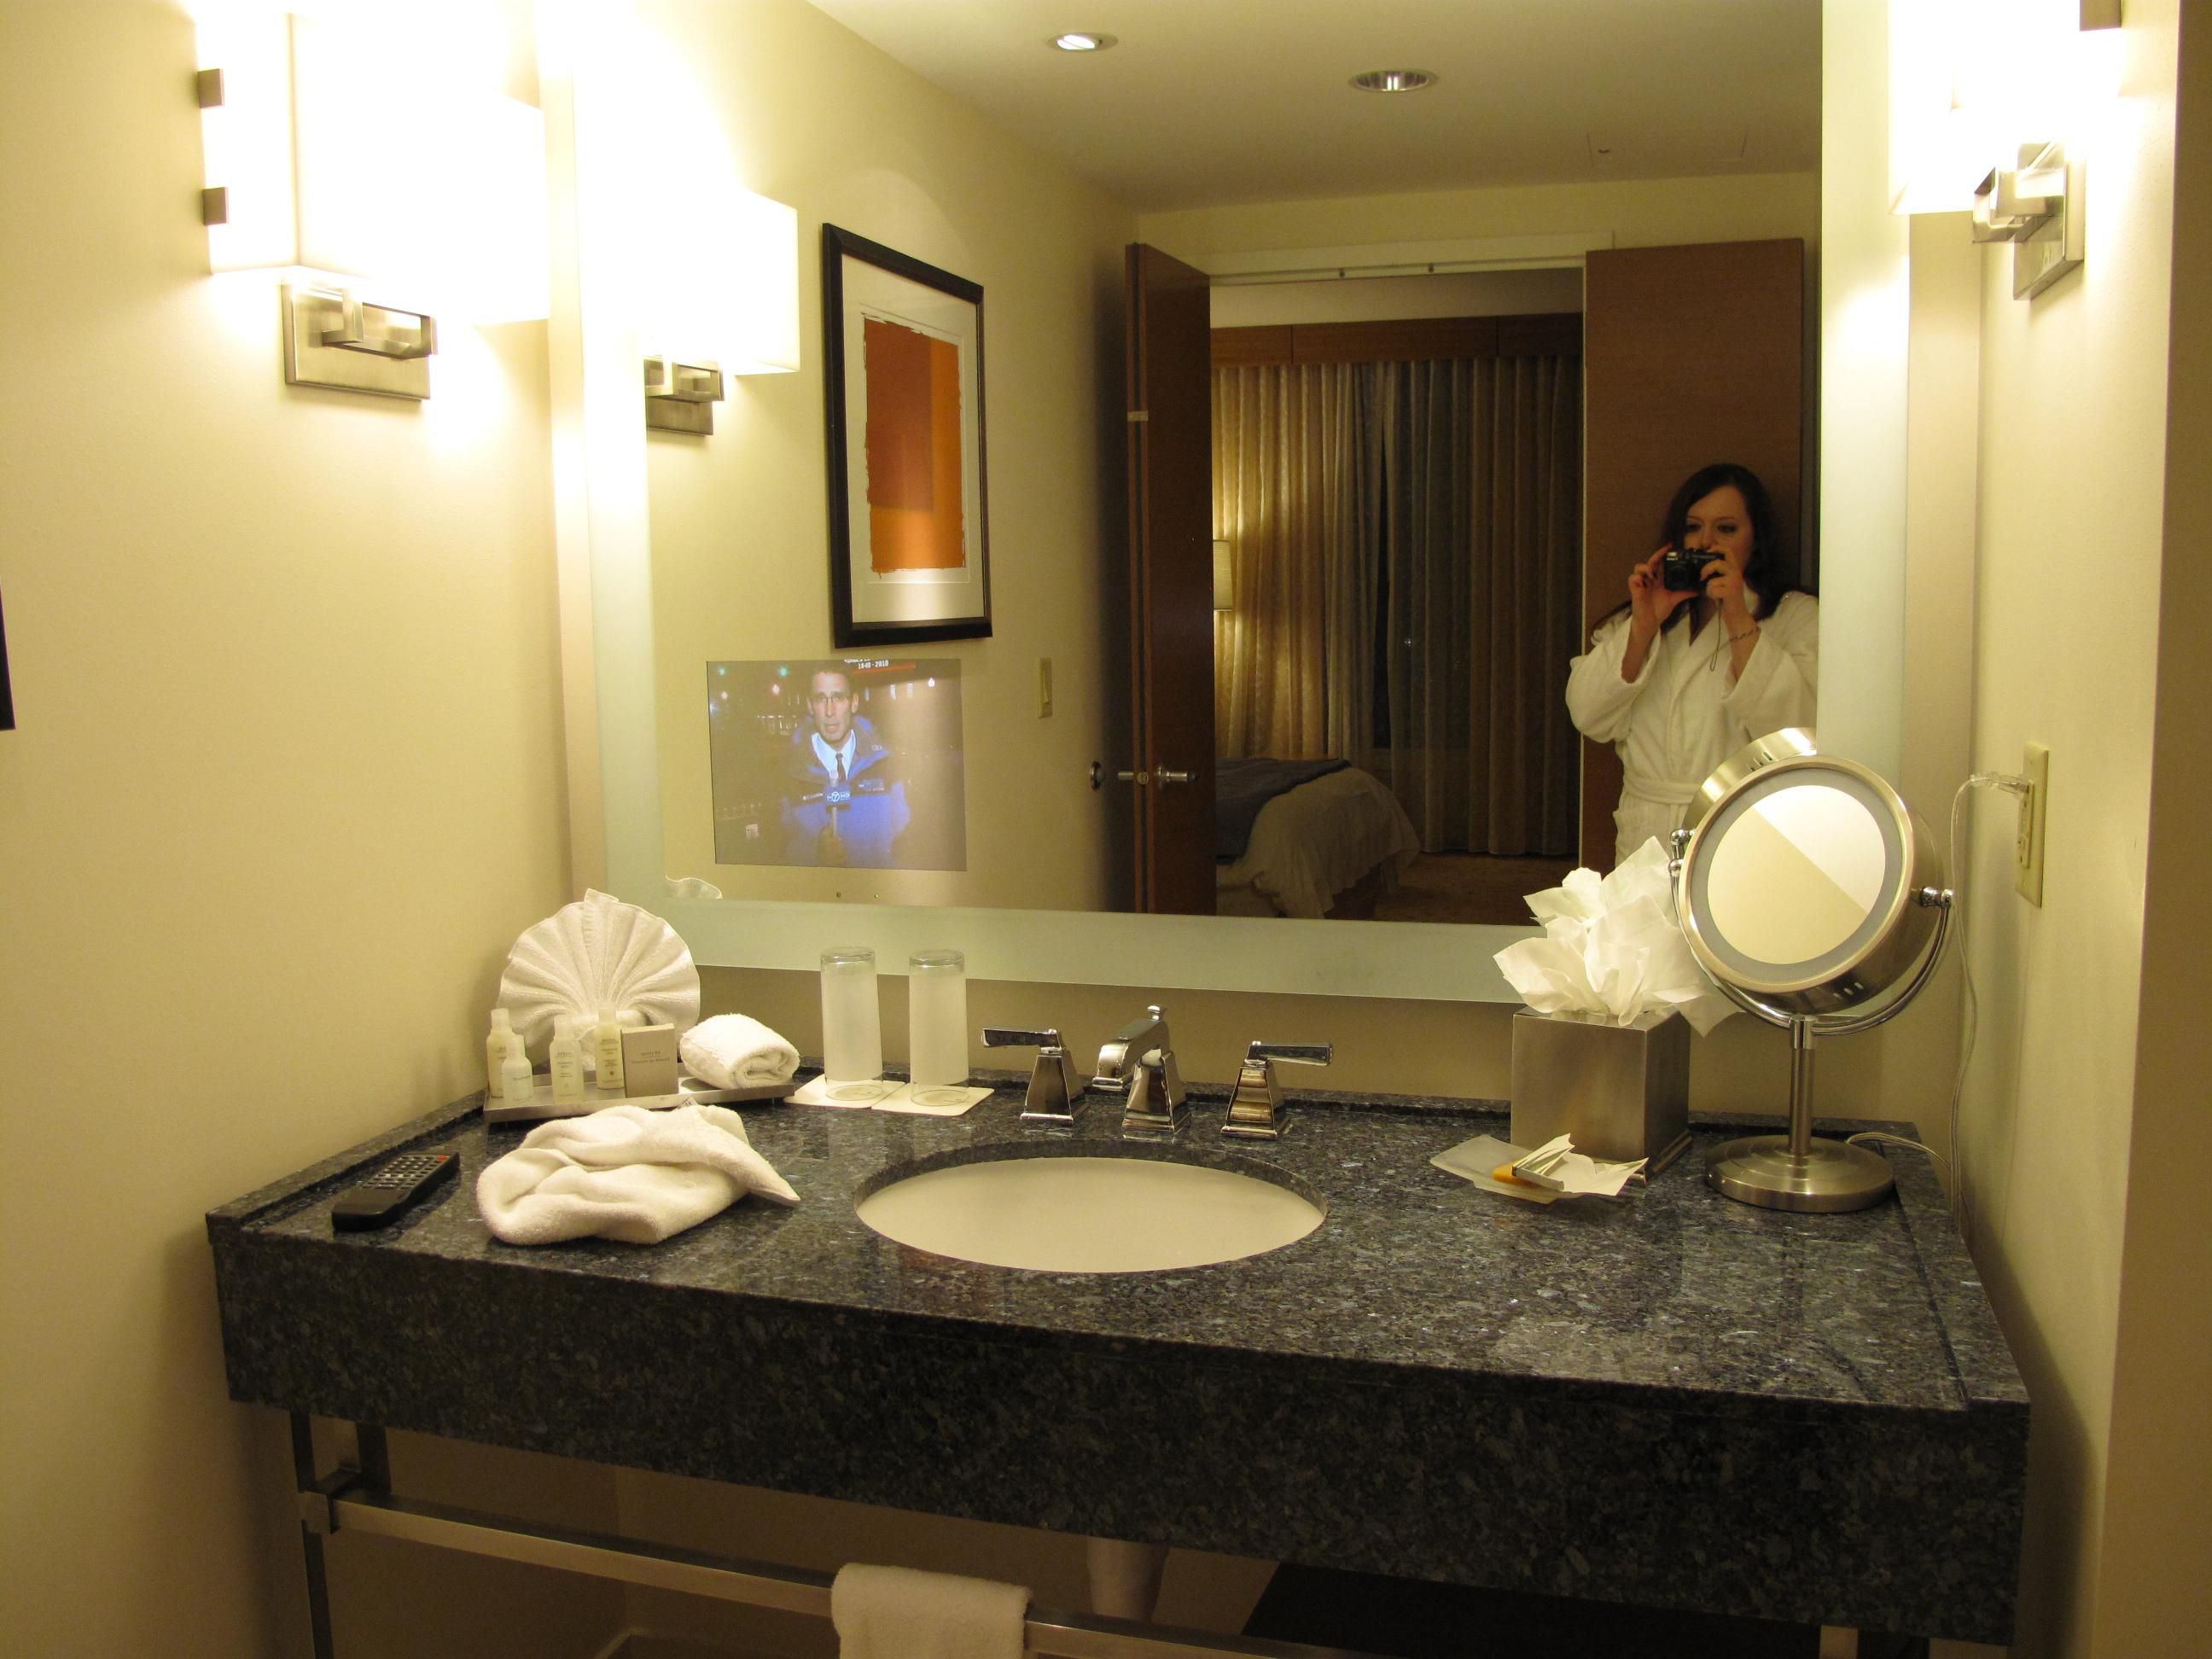 Hotel bathroom mirrors - And A Tv Inside The Bathroom Mirror